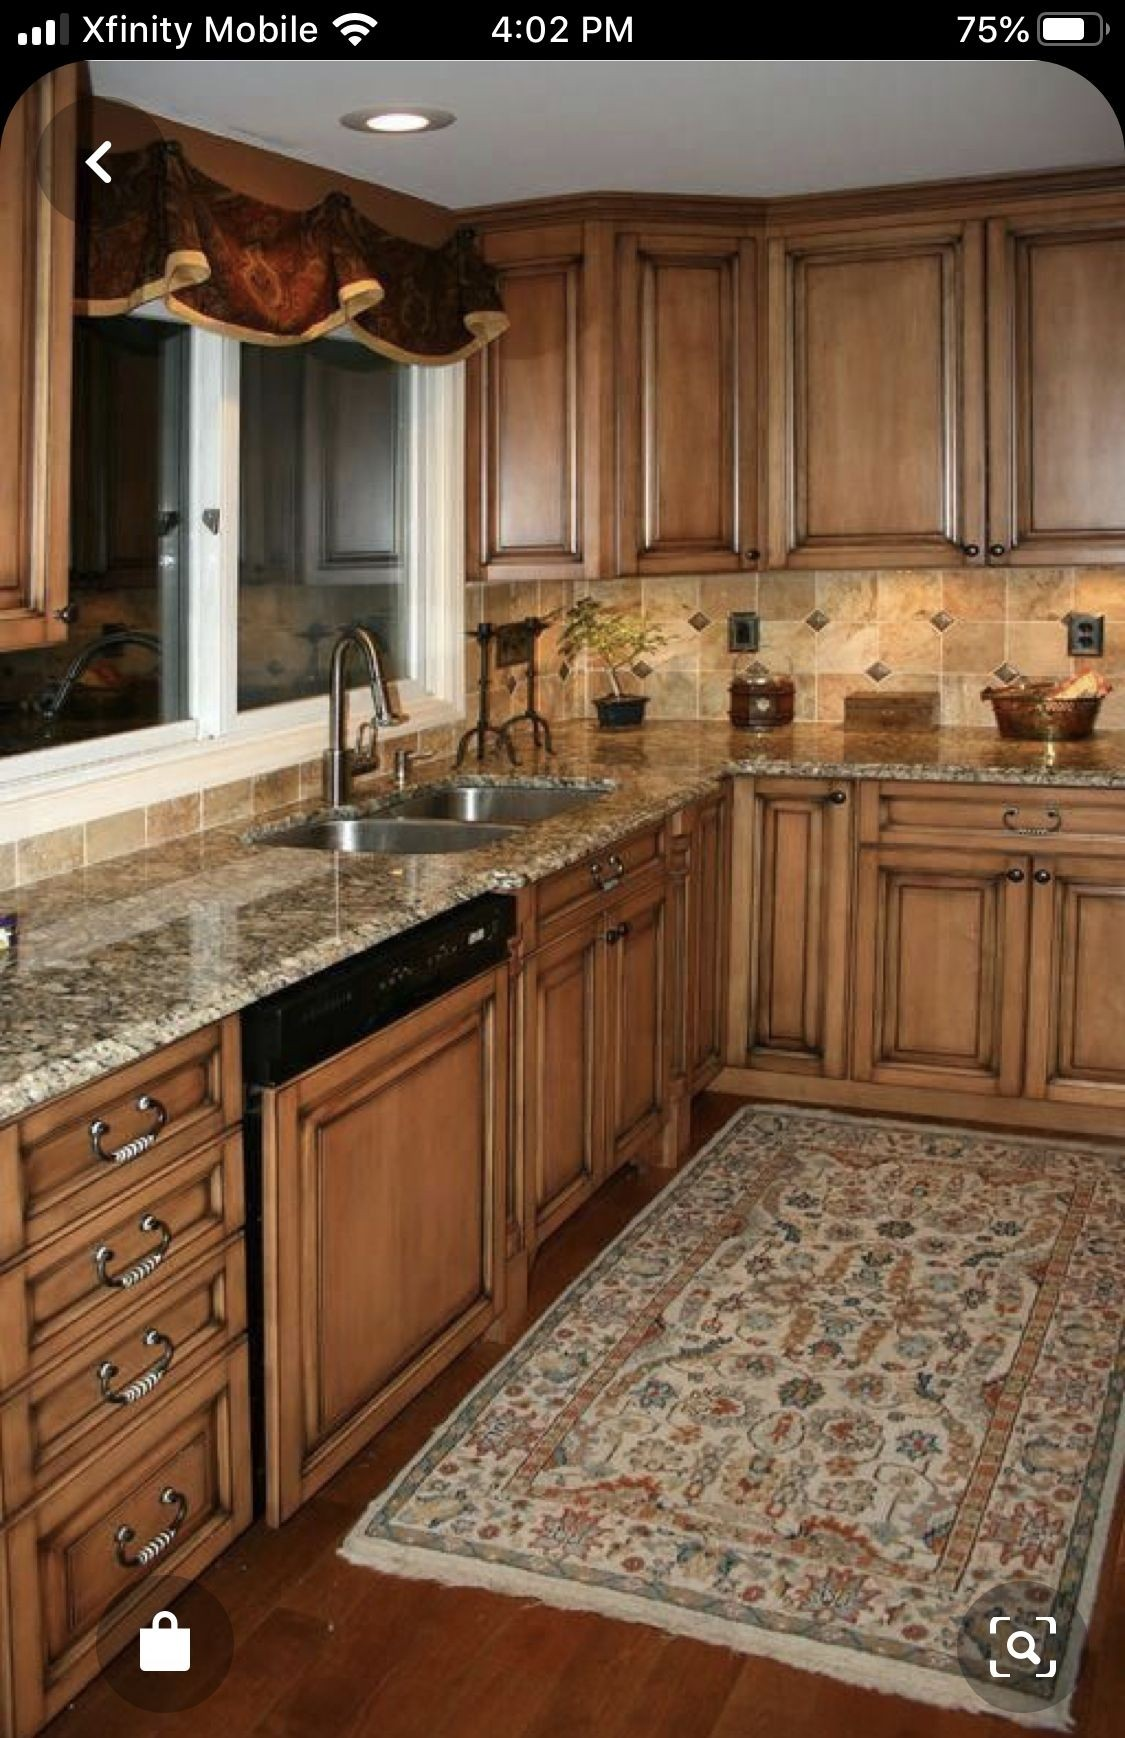 Bon Kitchens17l Maple Kitchen Cabinets With Burnt Sugar Glaze Jpg By